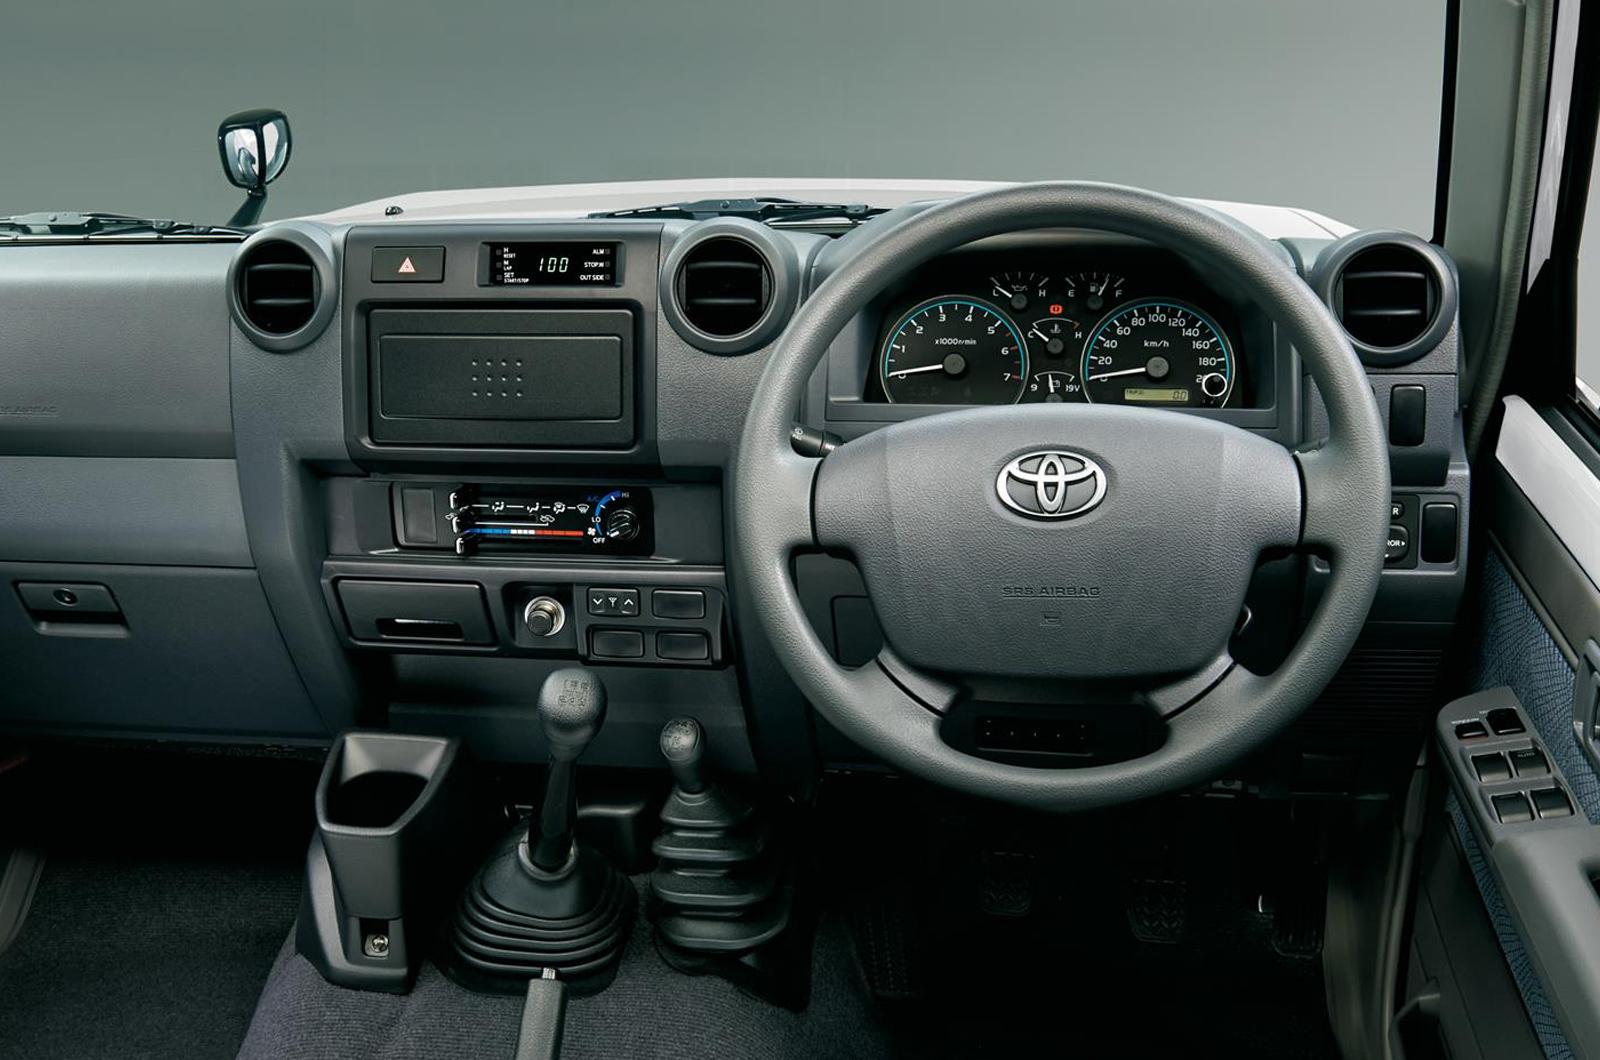 Toyota Land Cruiser 70 interior